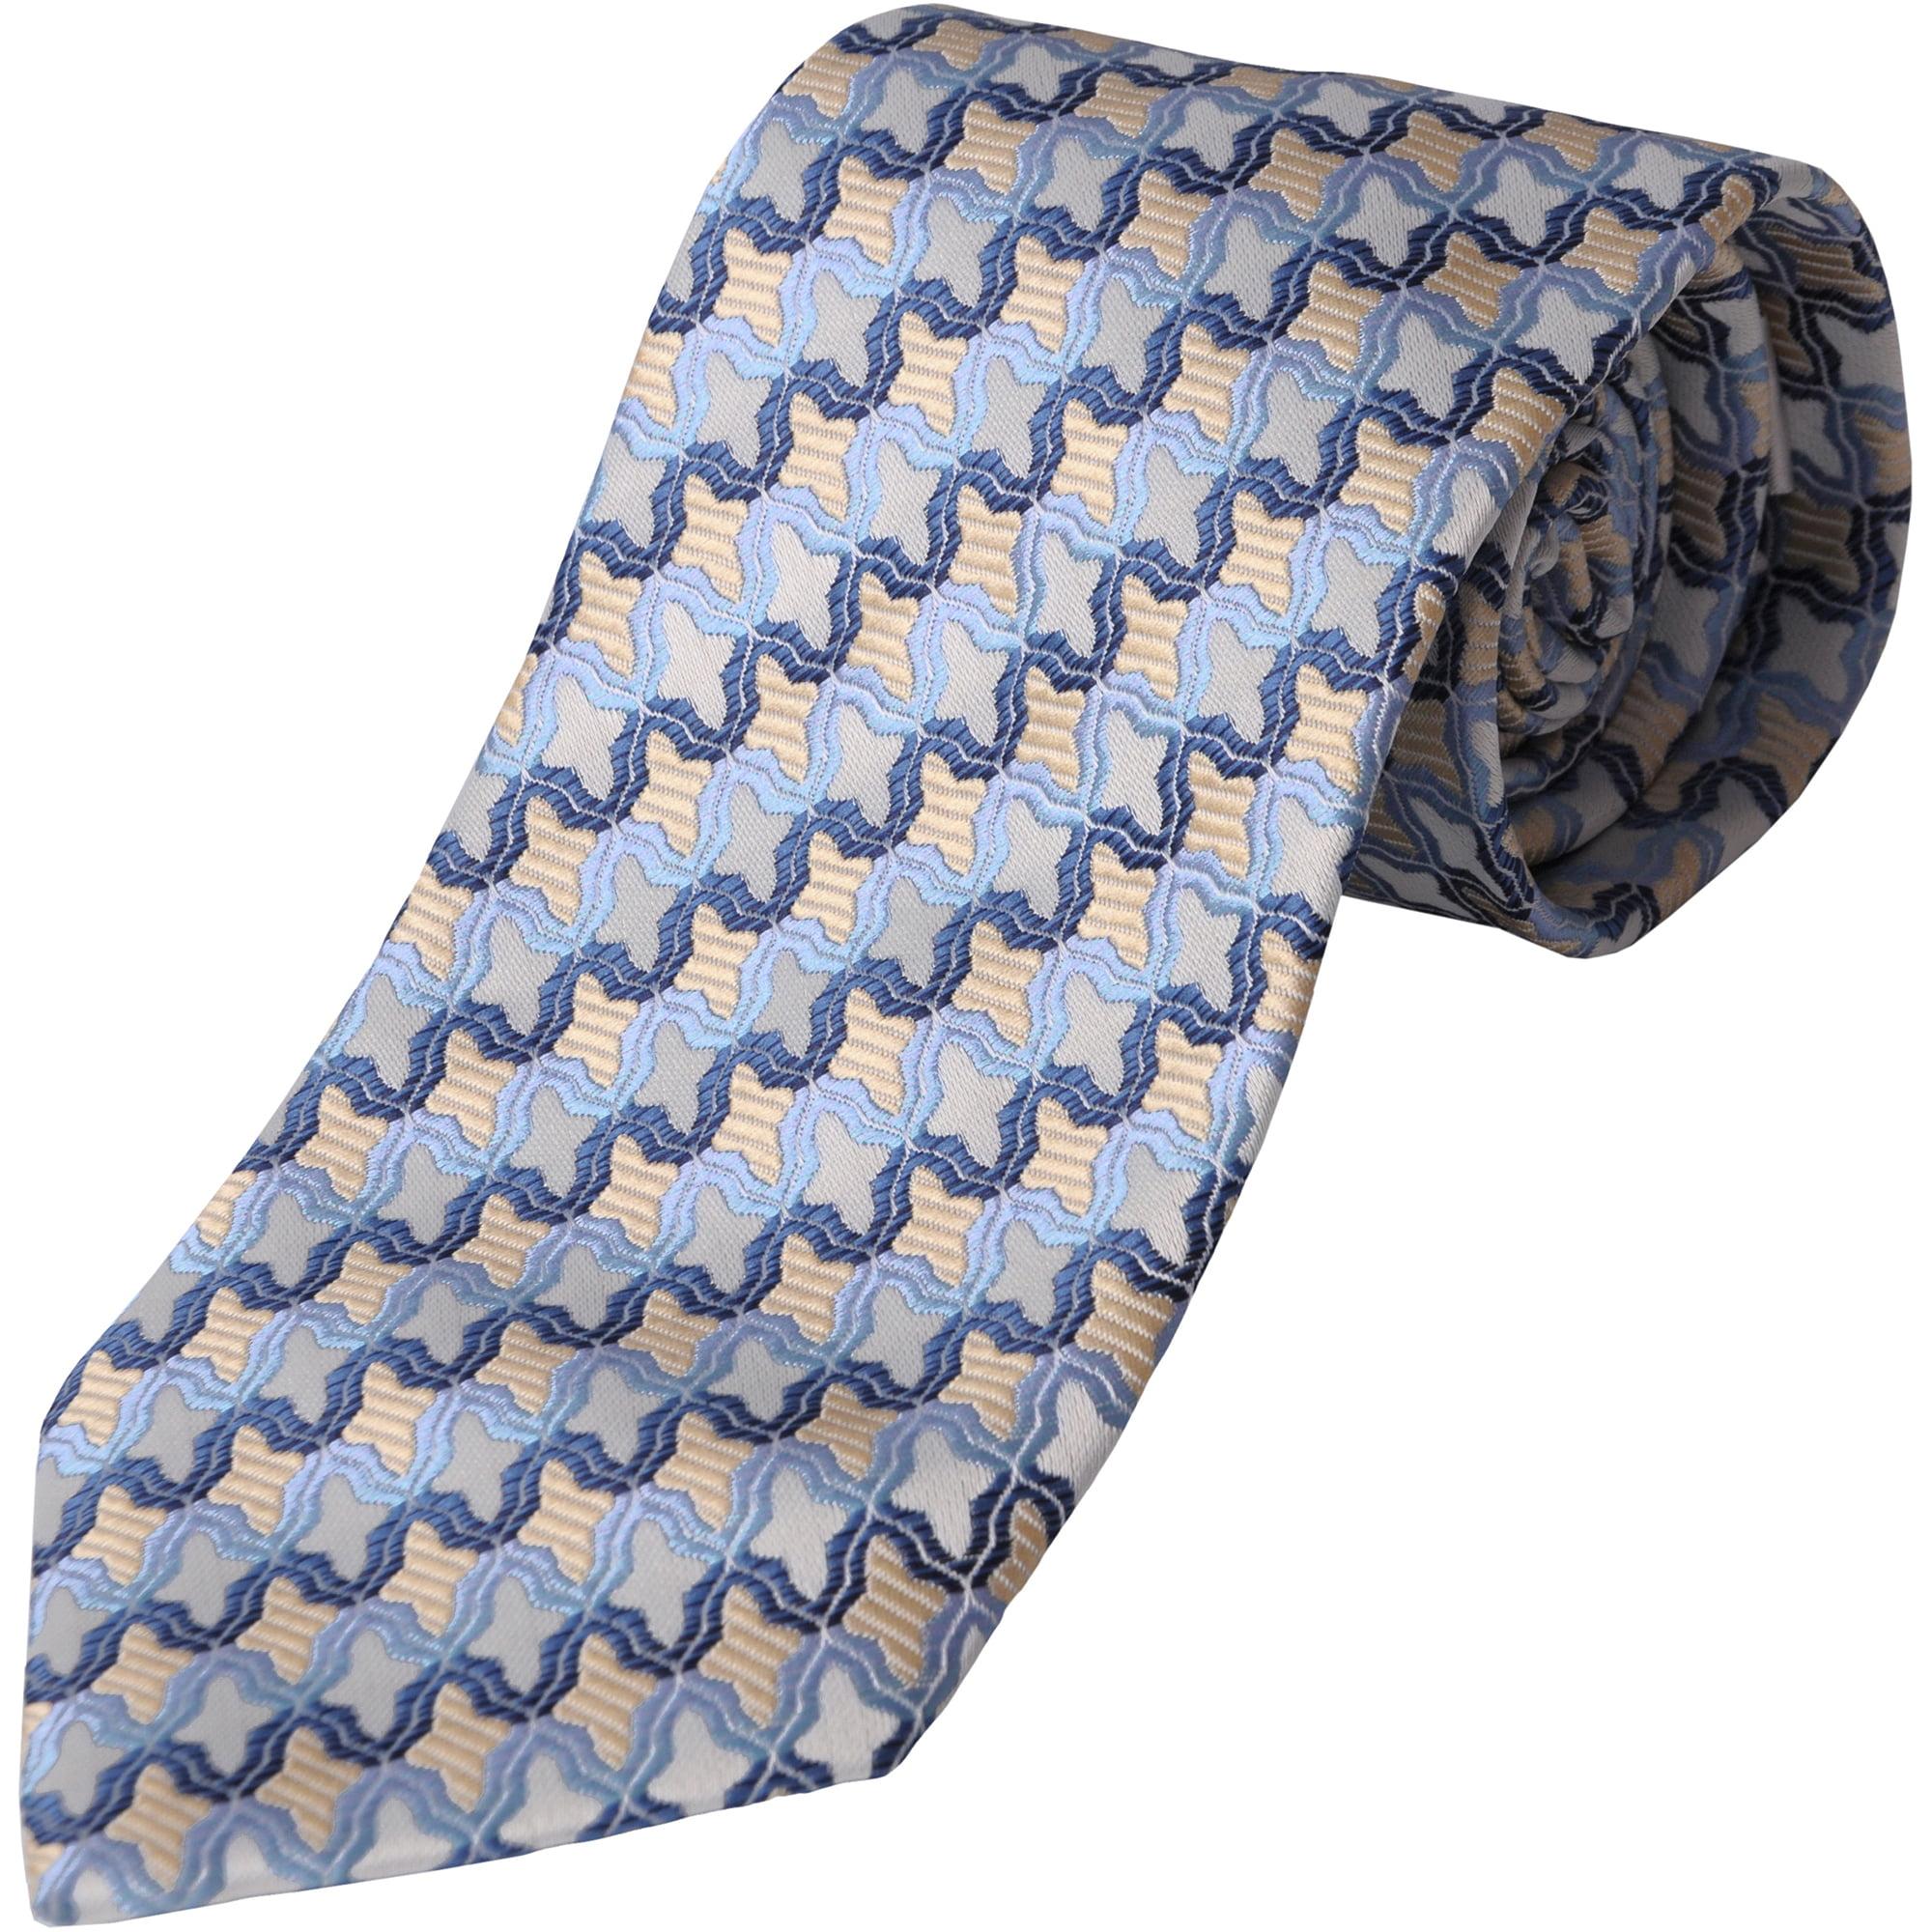 Daxx St. P Mens Microfiber Tie and Hanky Set